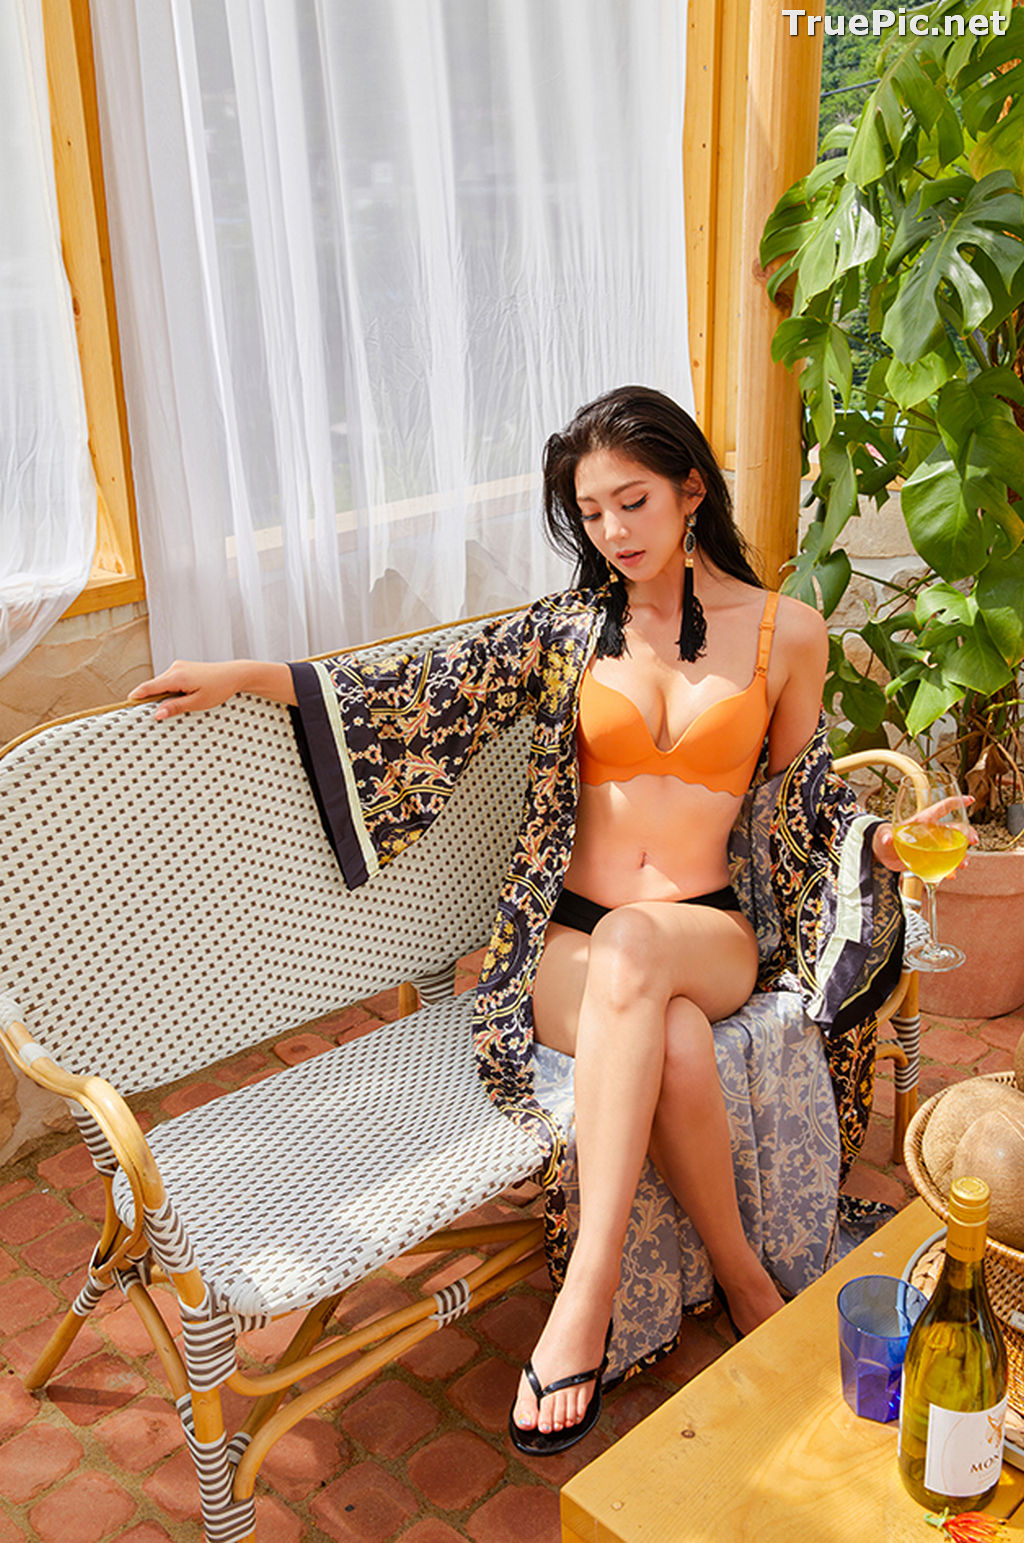 Image Korean Fashion Model – Lee Chae Eun (이채은) – Come On Vincent Lingerie #6 - TruePic.net - Picture-2